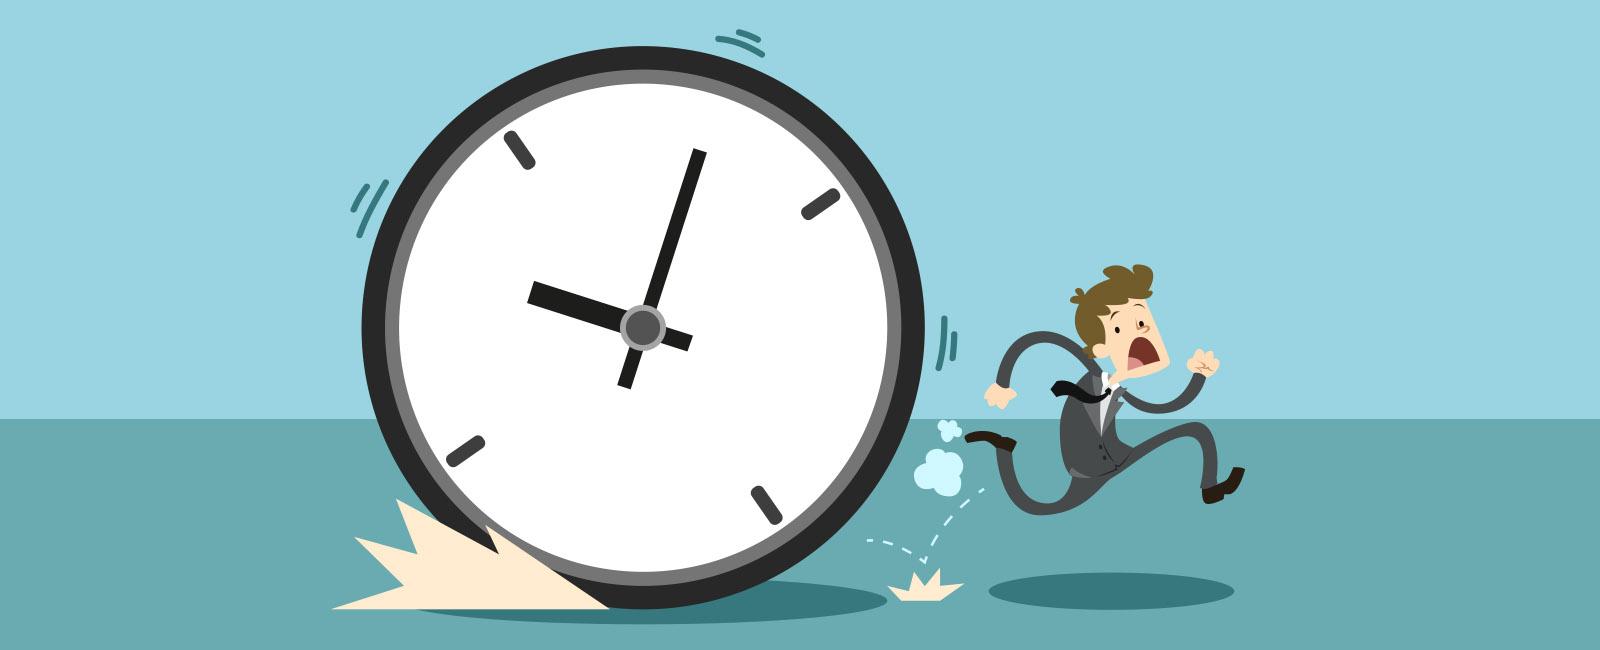 How flexible should your work schedule be